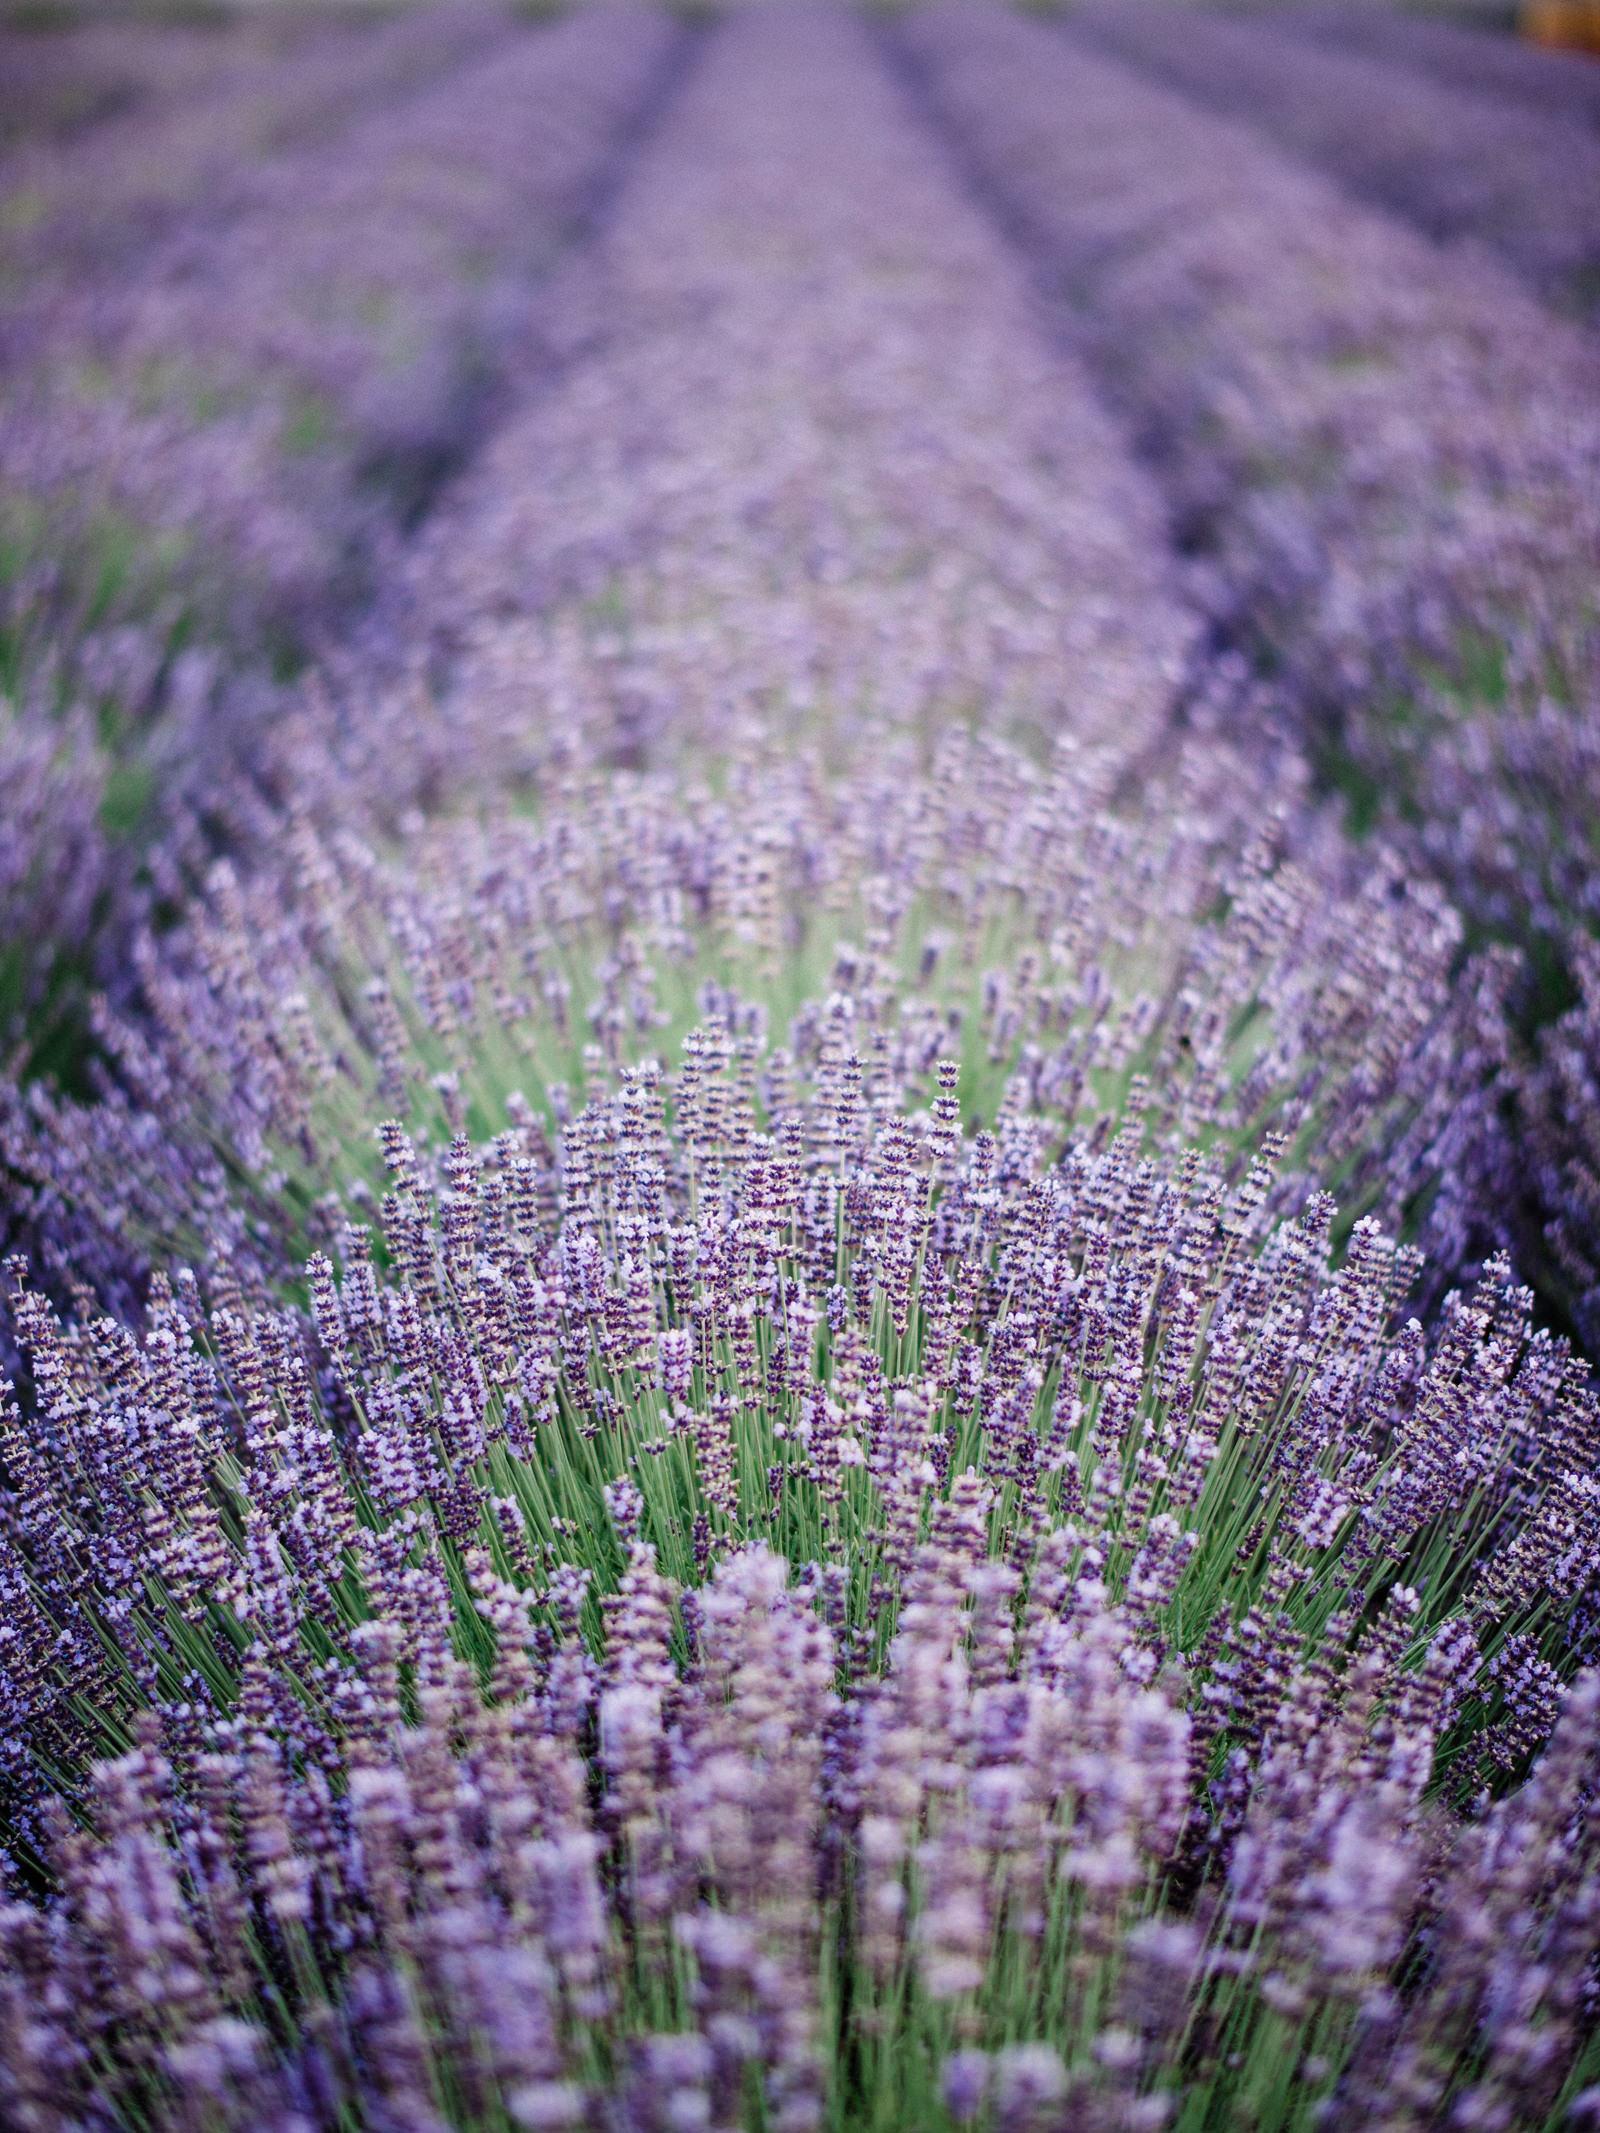 093-woodinville-lavendar-farm-wedding-with-golden-glowy-photos.jpg